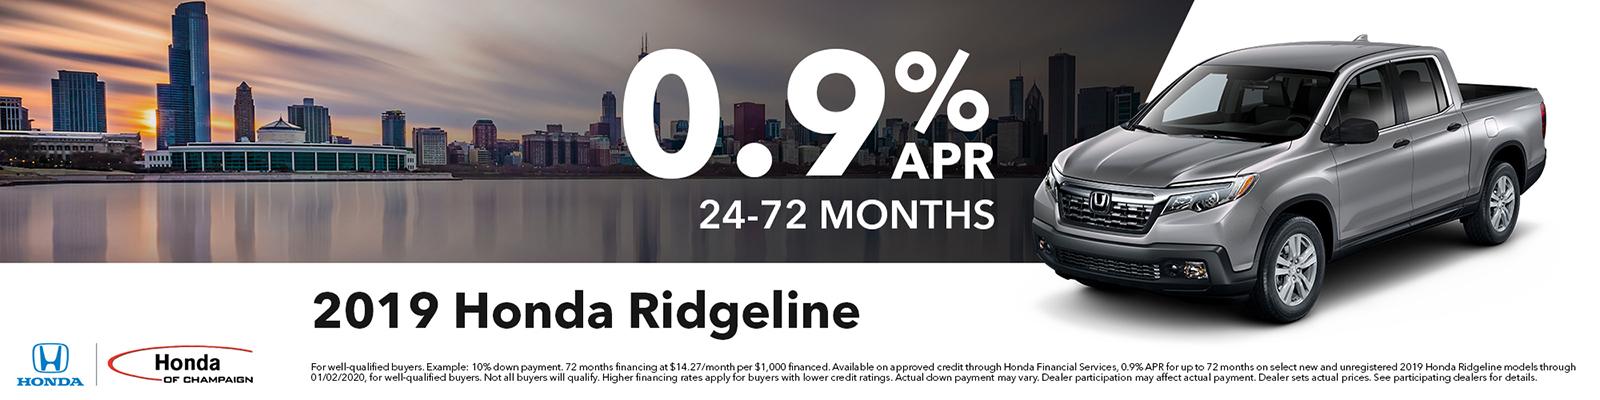 Honda Ridgeline Special